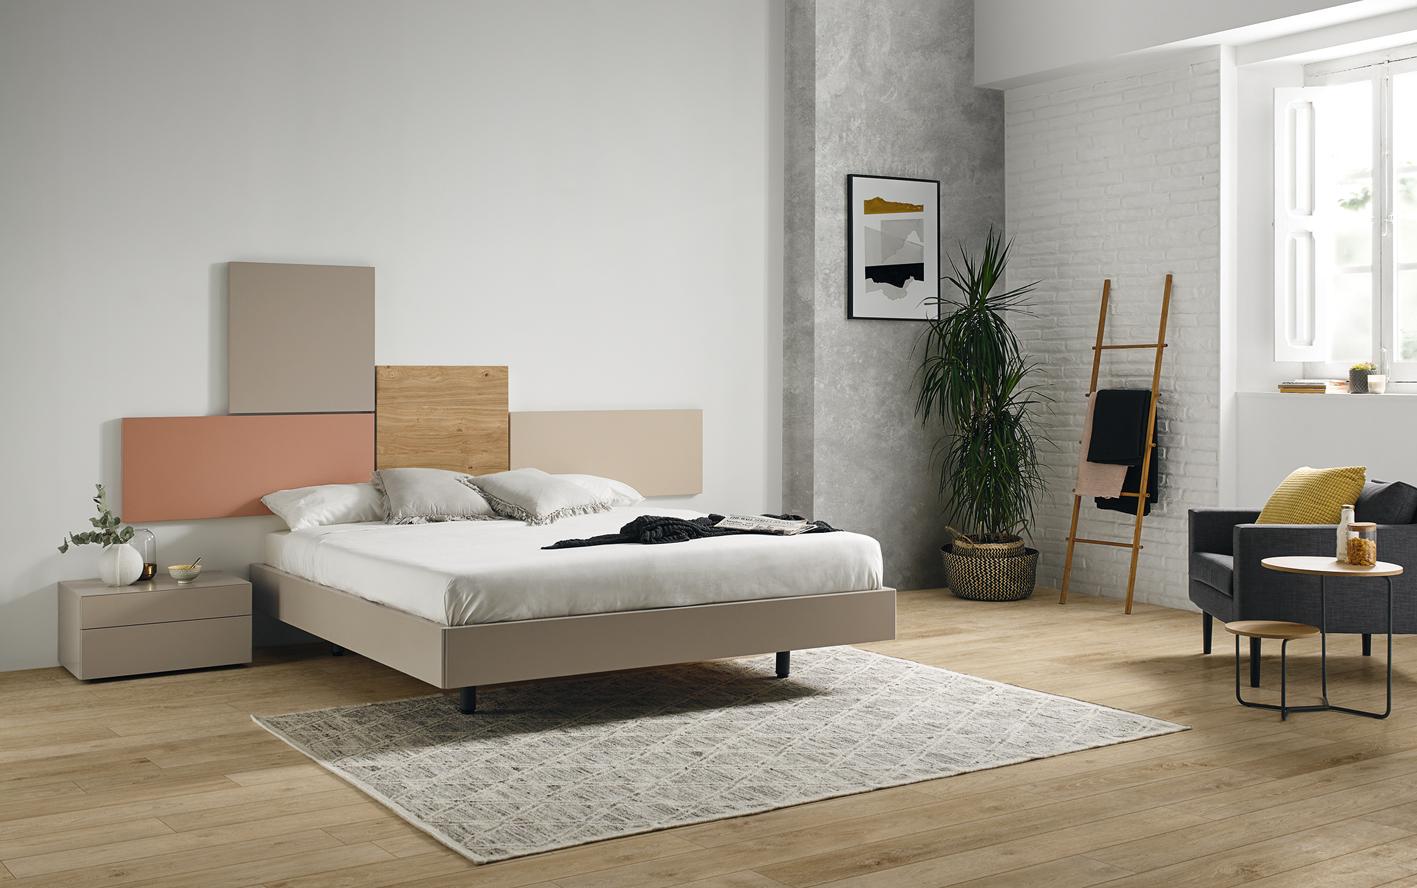 dormitorio-moderno-mobenia05